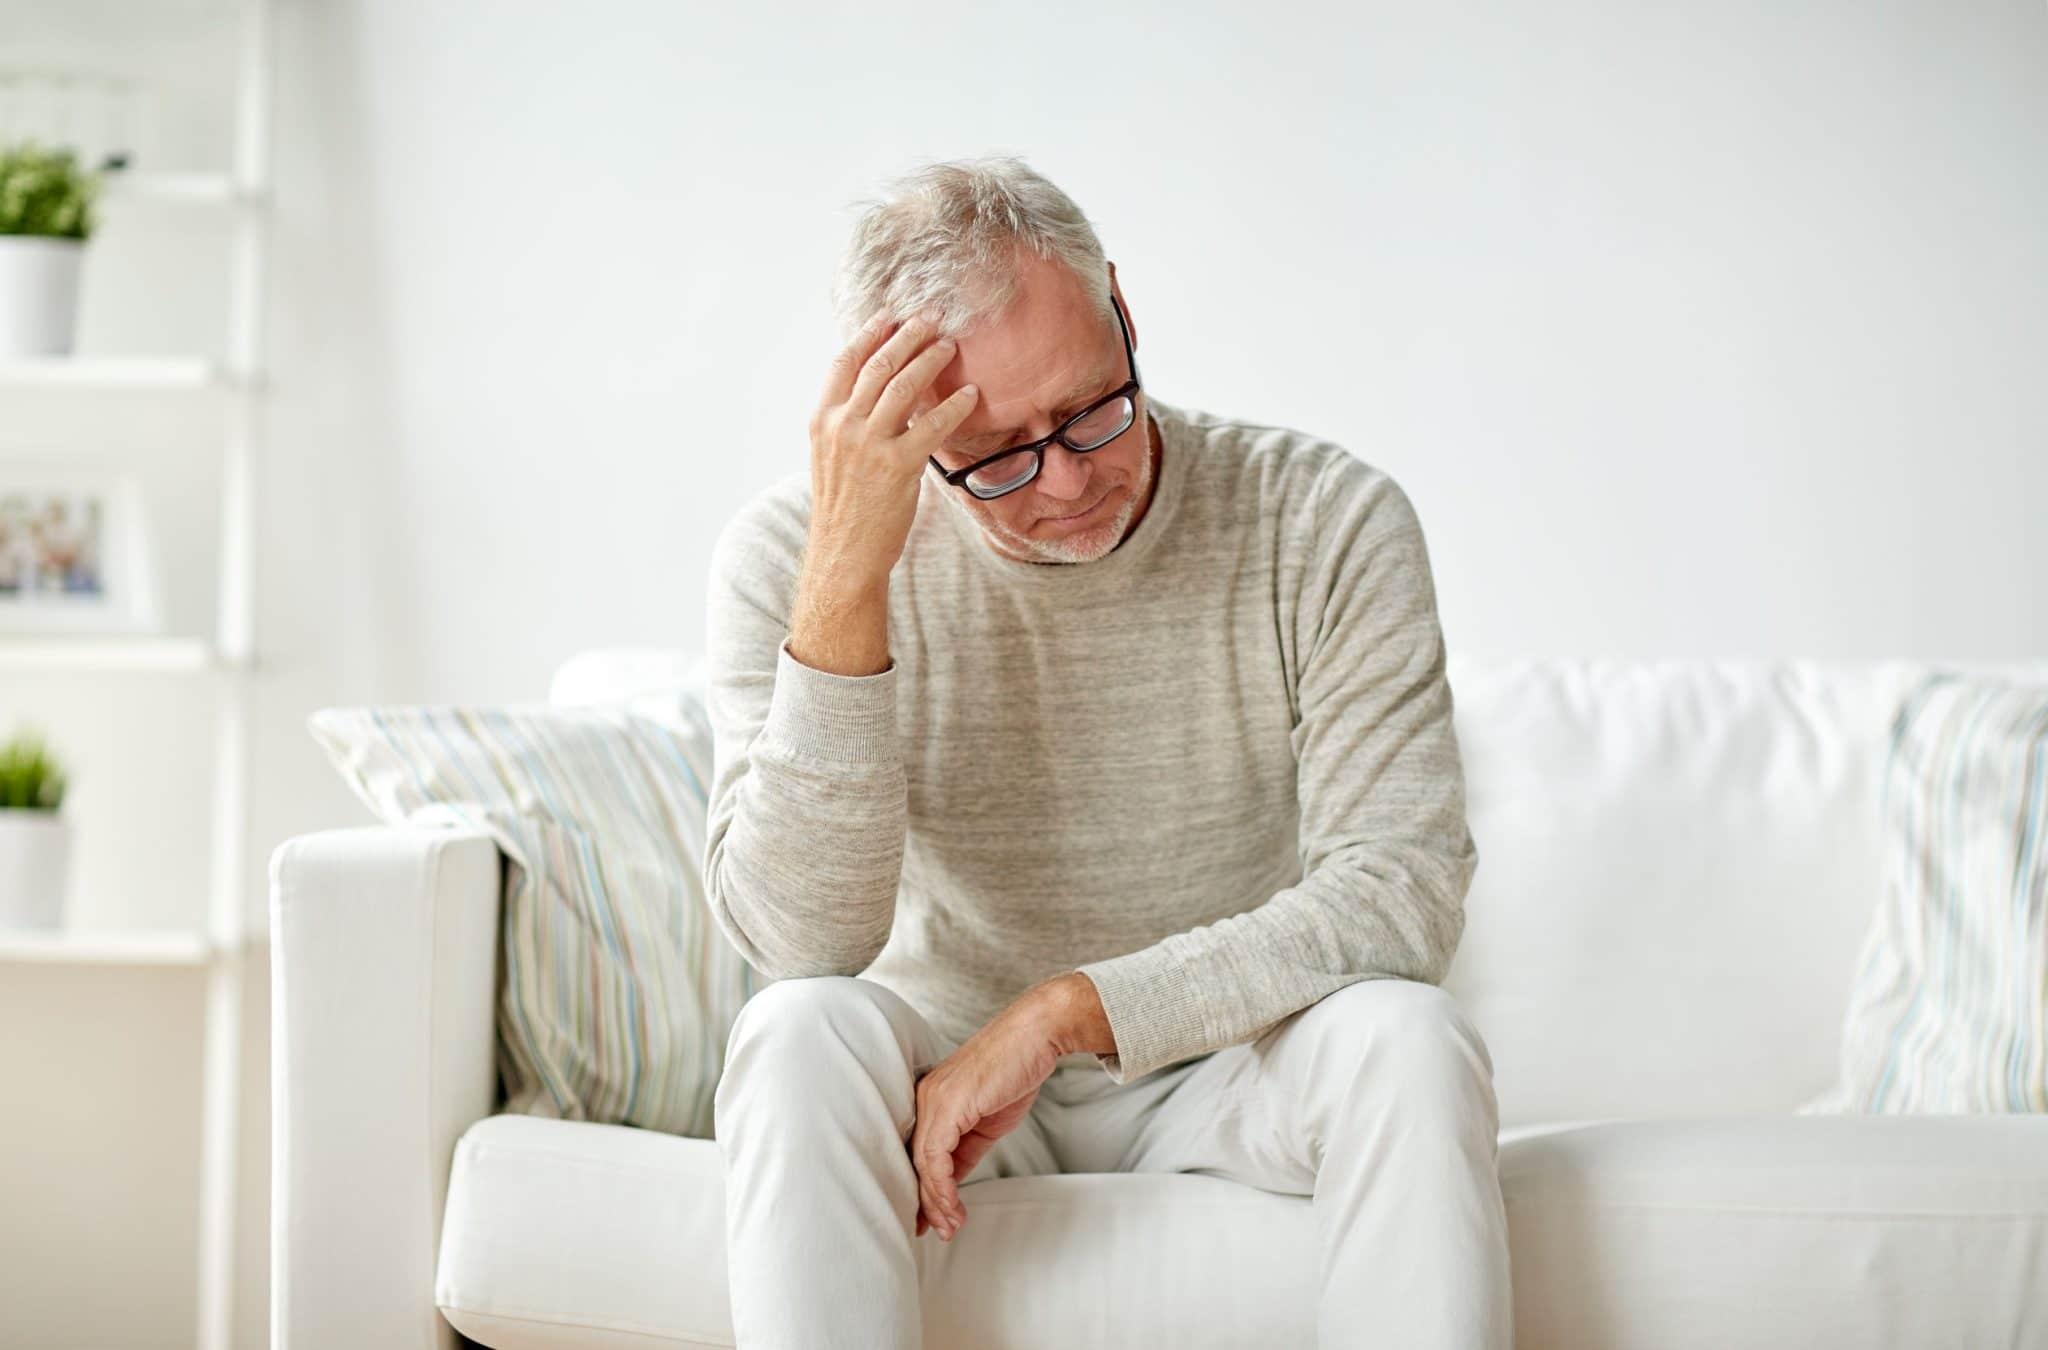 Worried Senior Man Sitting on Couch